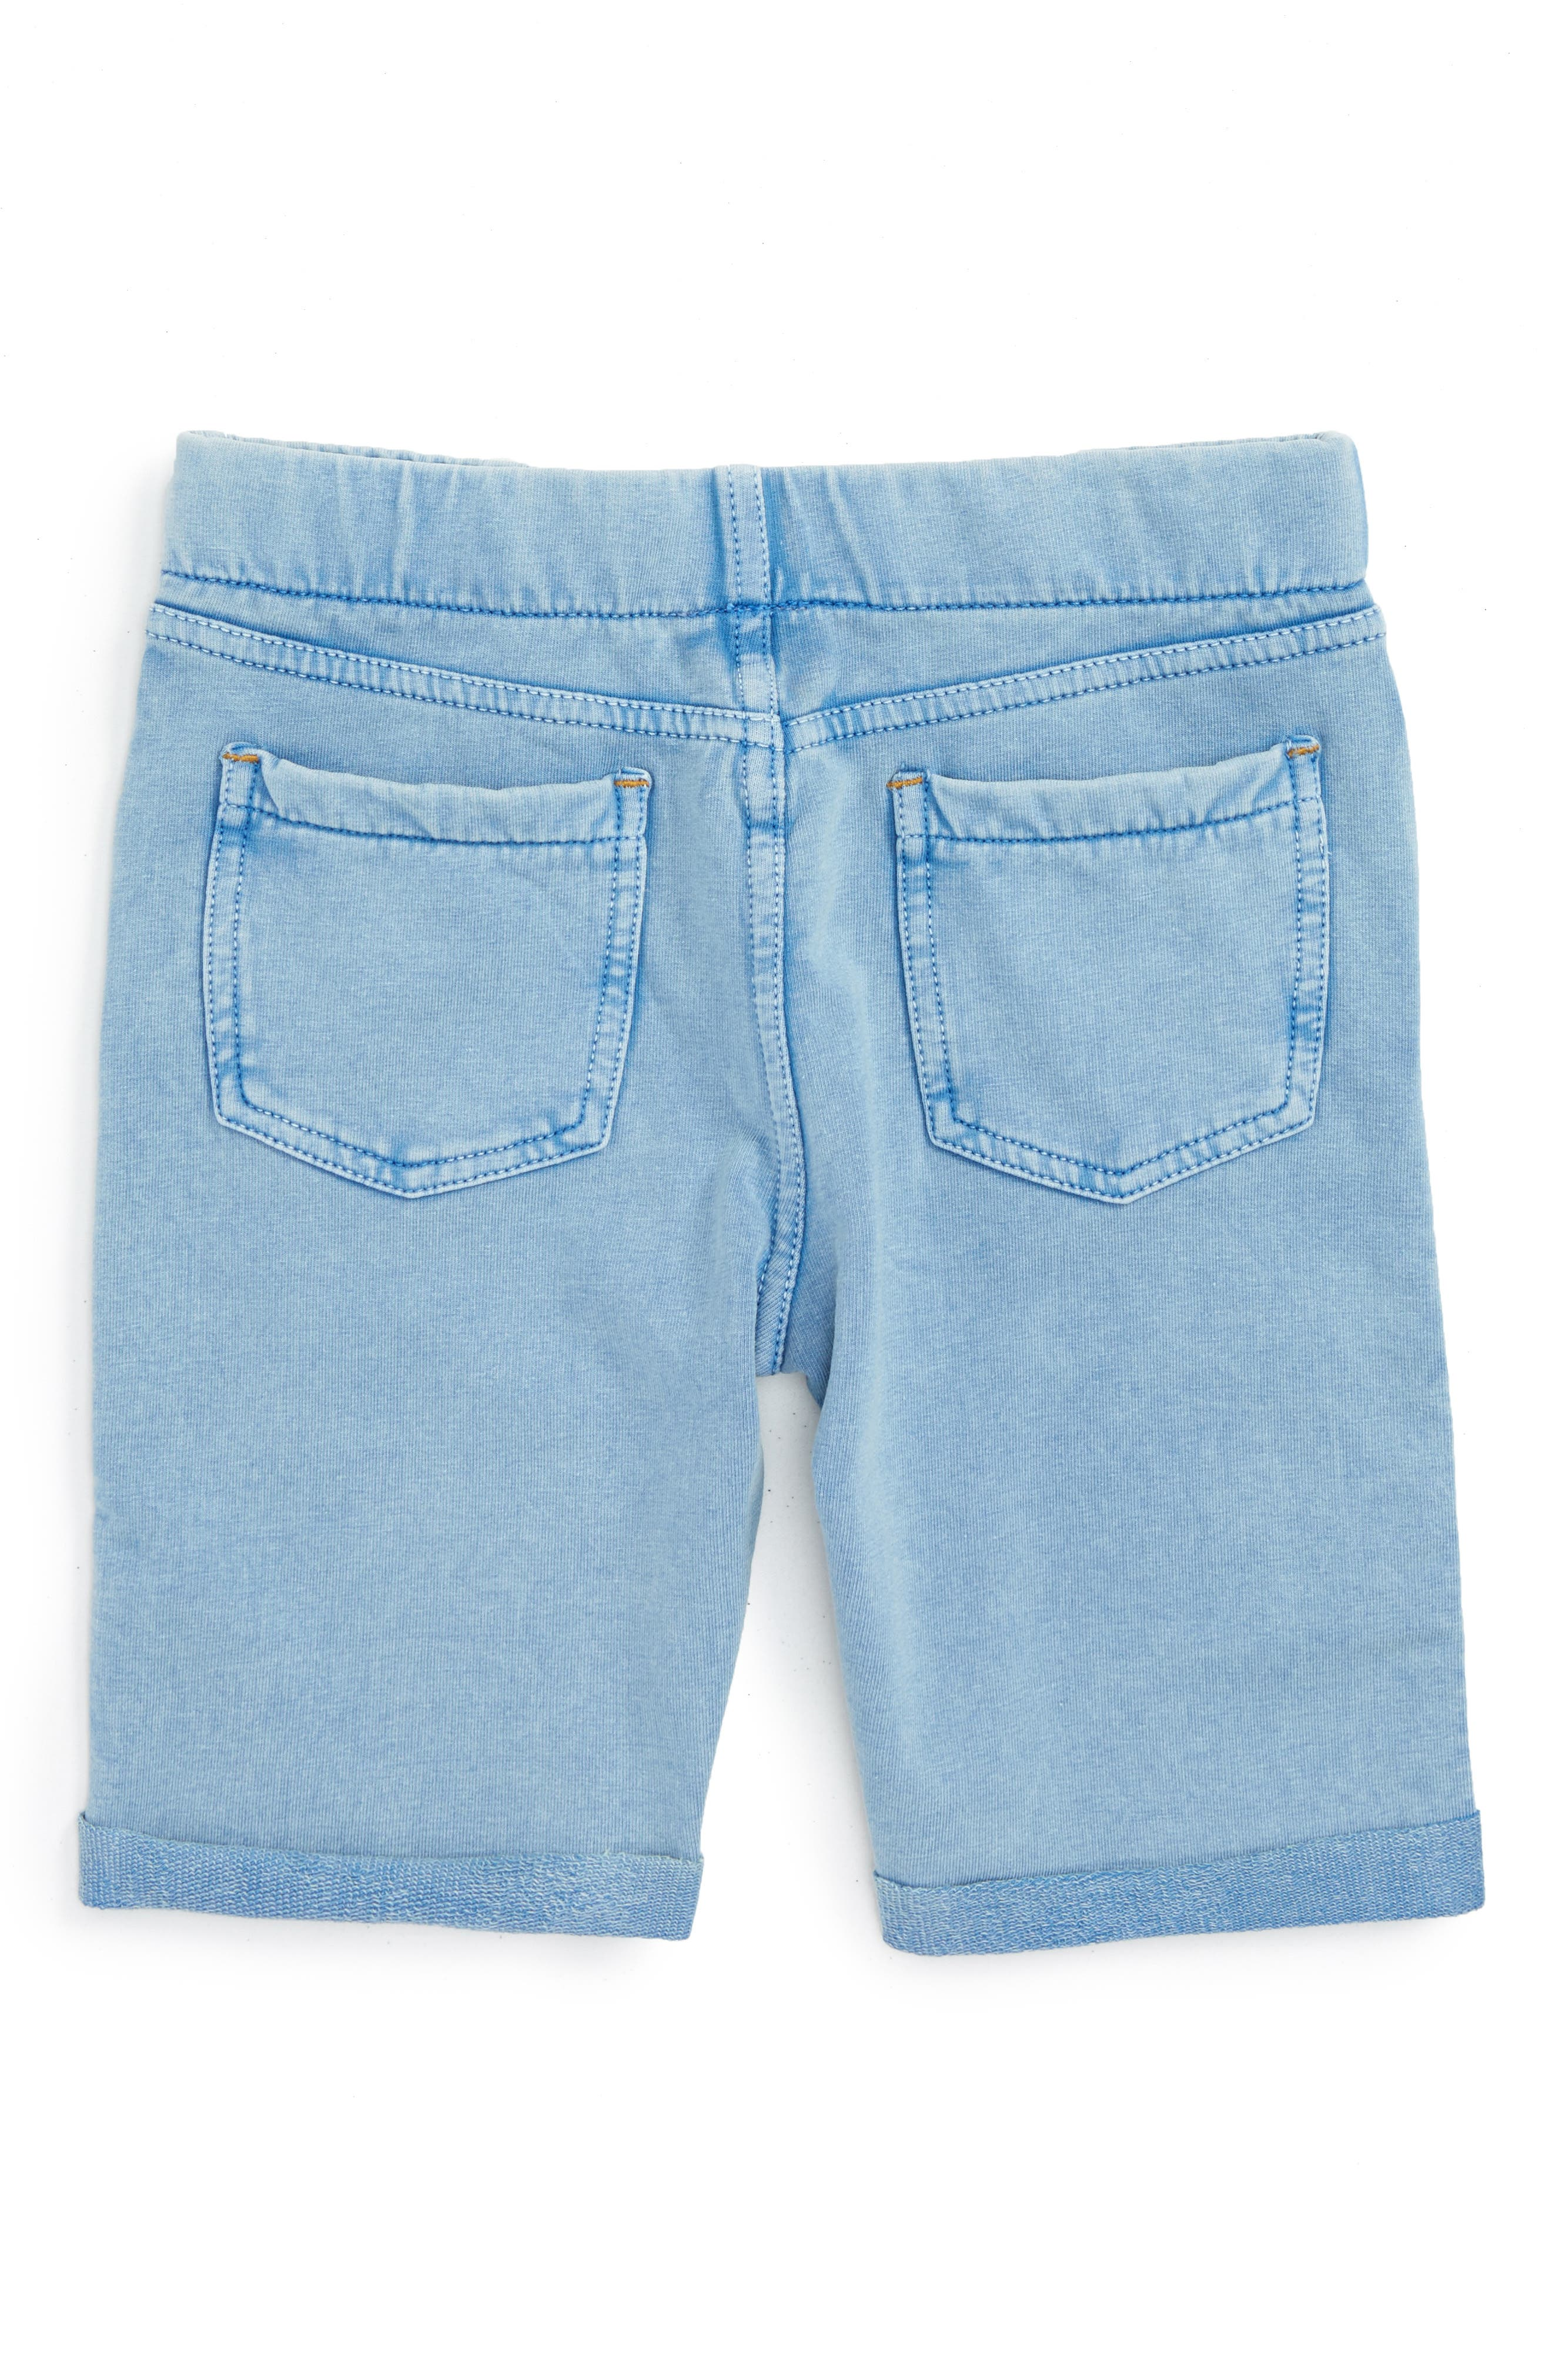 'Jenna' Jegging Shorts,                             Main thumbnail 4, color,